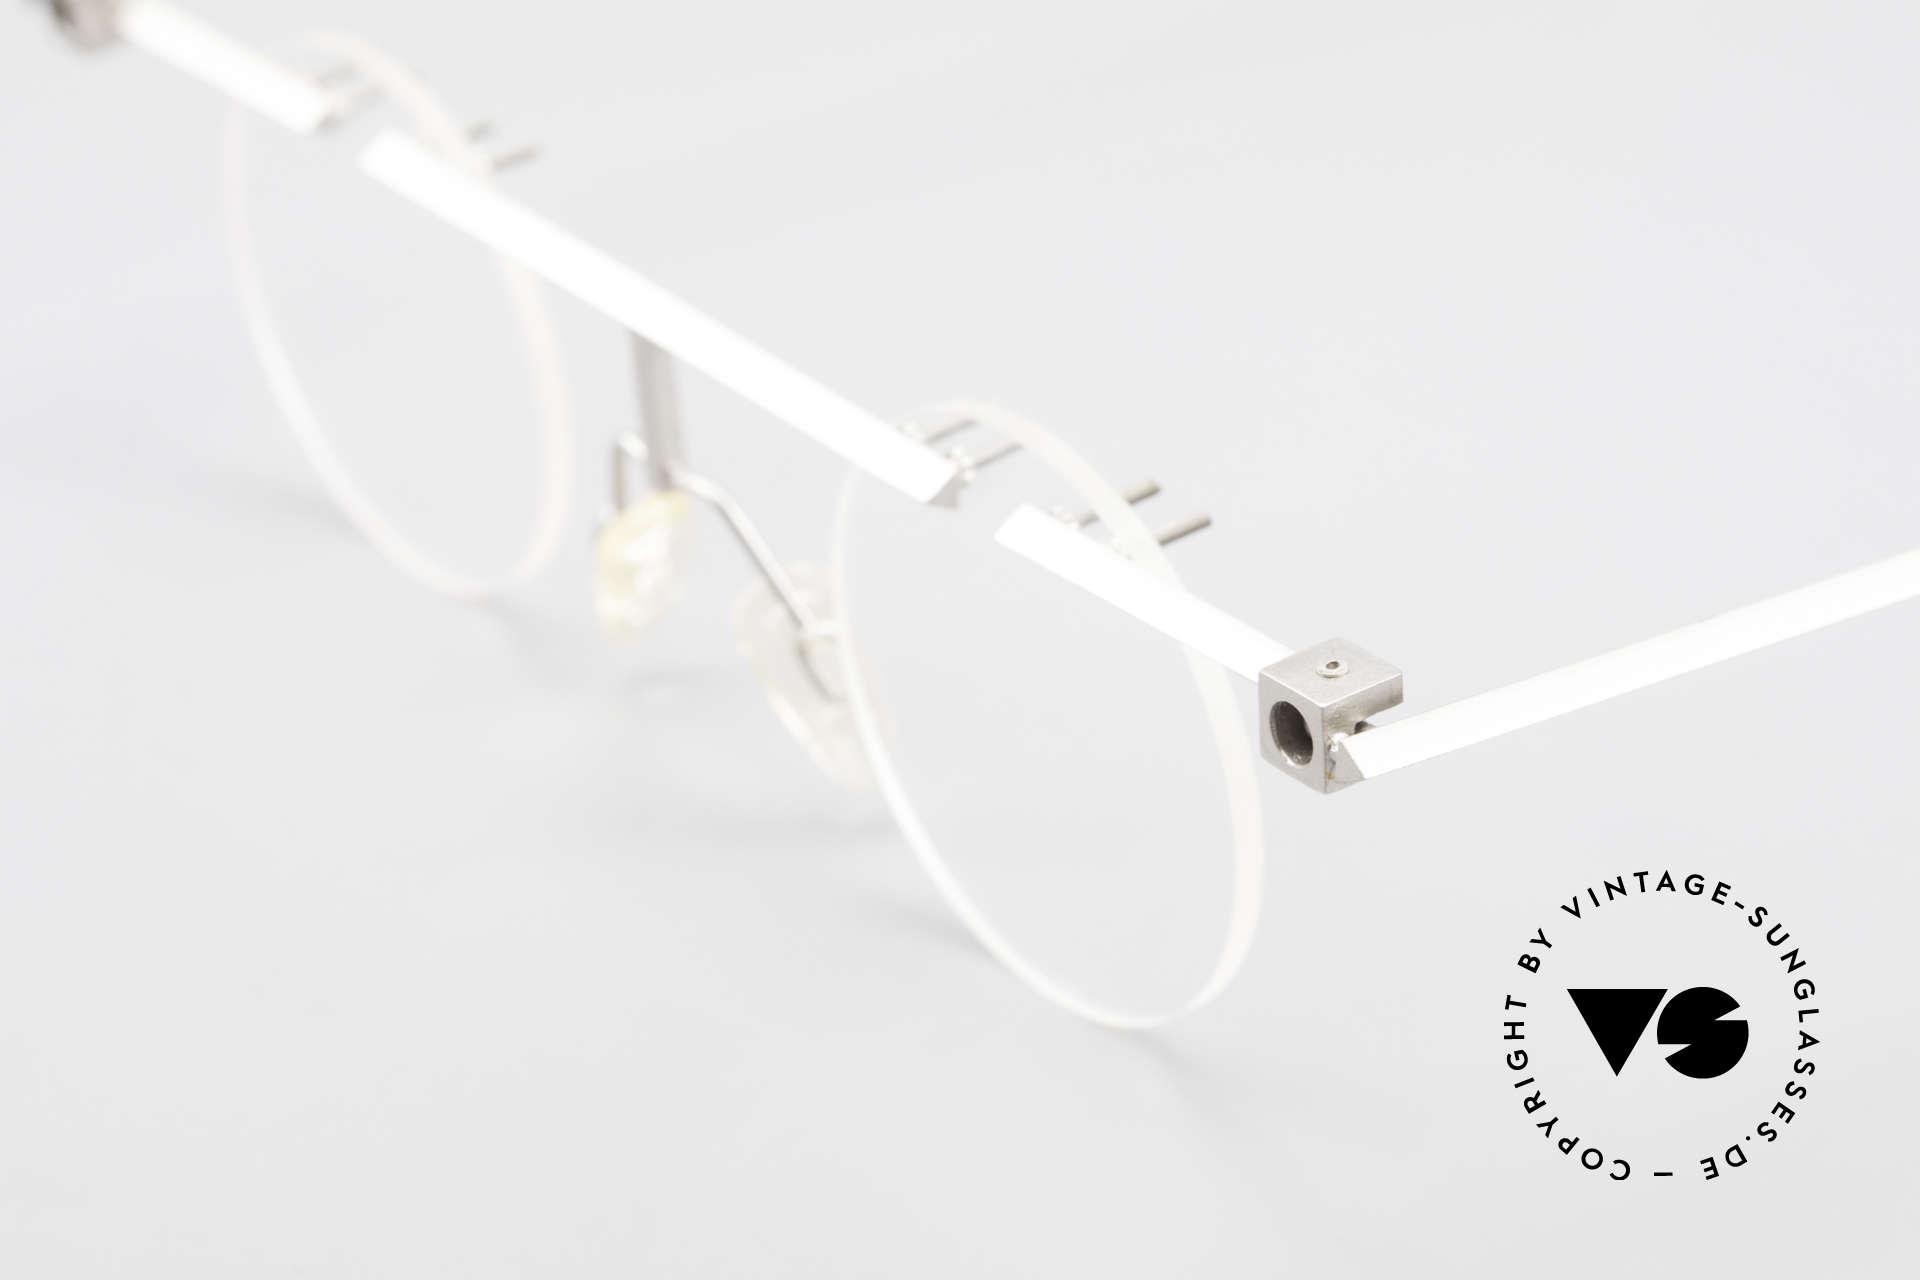 B. Angeletti Sammlerstück Bauhaus Frame Limited Edition, never been worn; made for optical lenses or sun lenses, Made for Men and Women